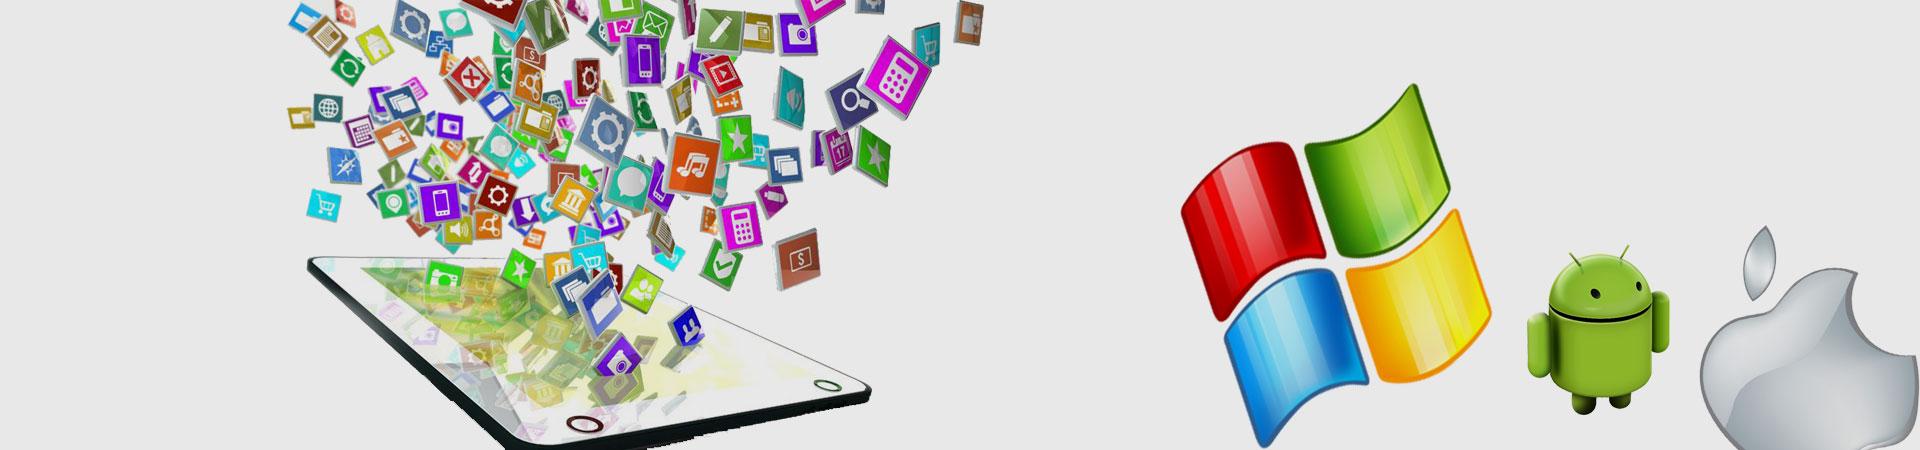 Mobil Uygulamalar IOS Android Windows